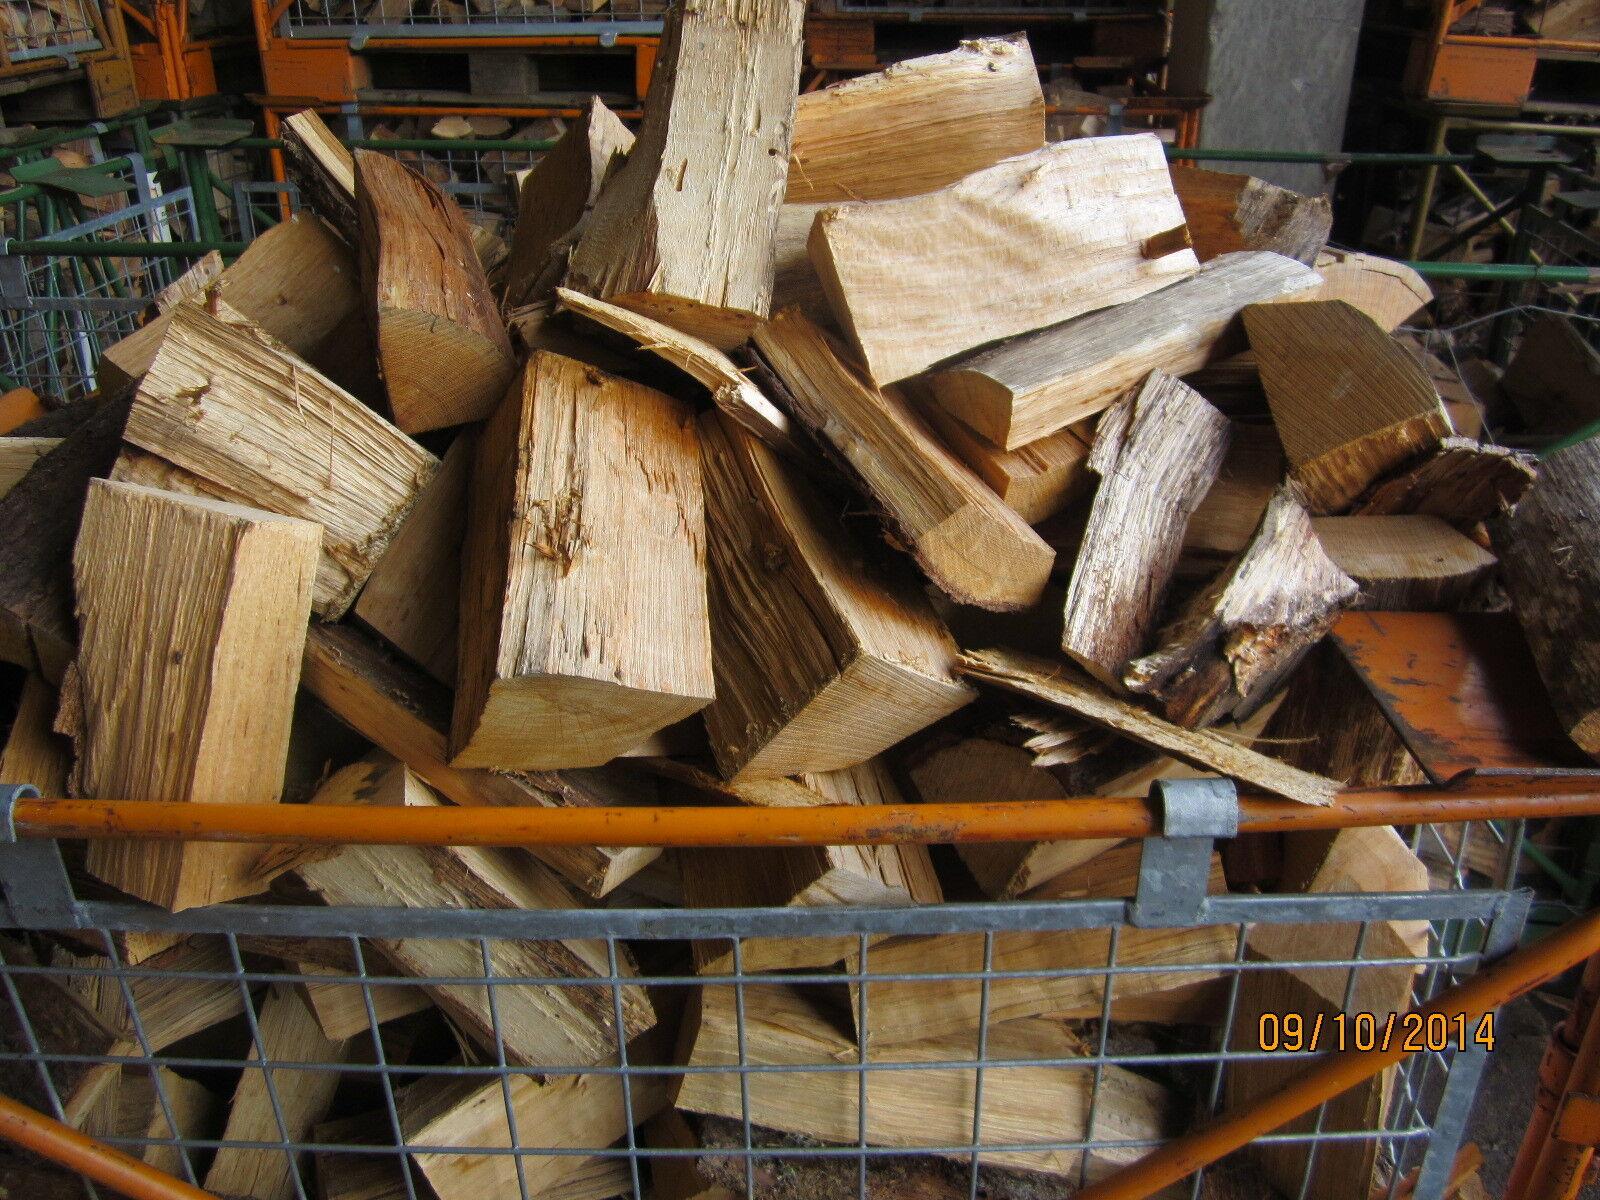 Brennholz buch eiche top top top qualität kamin ofen holz 2358ac